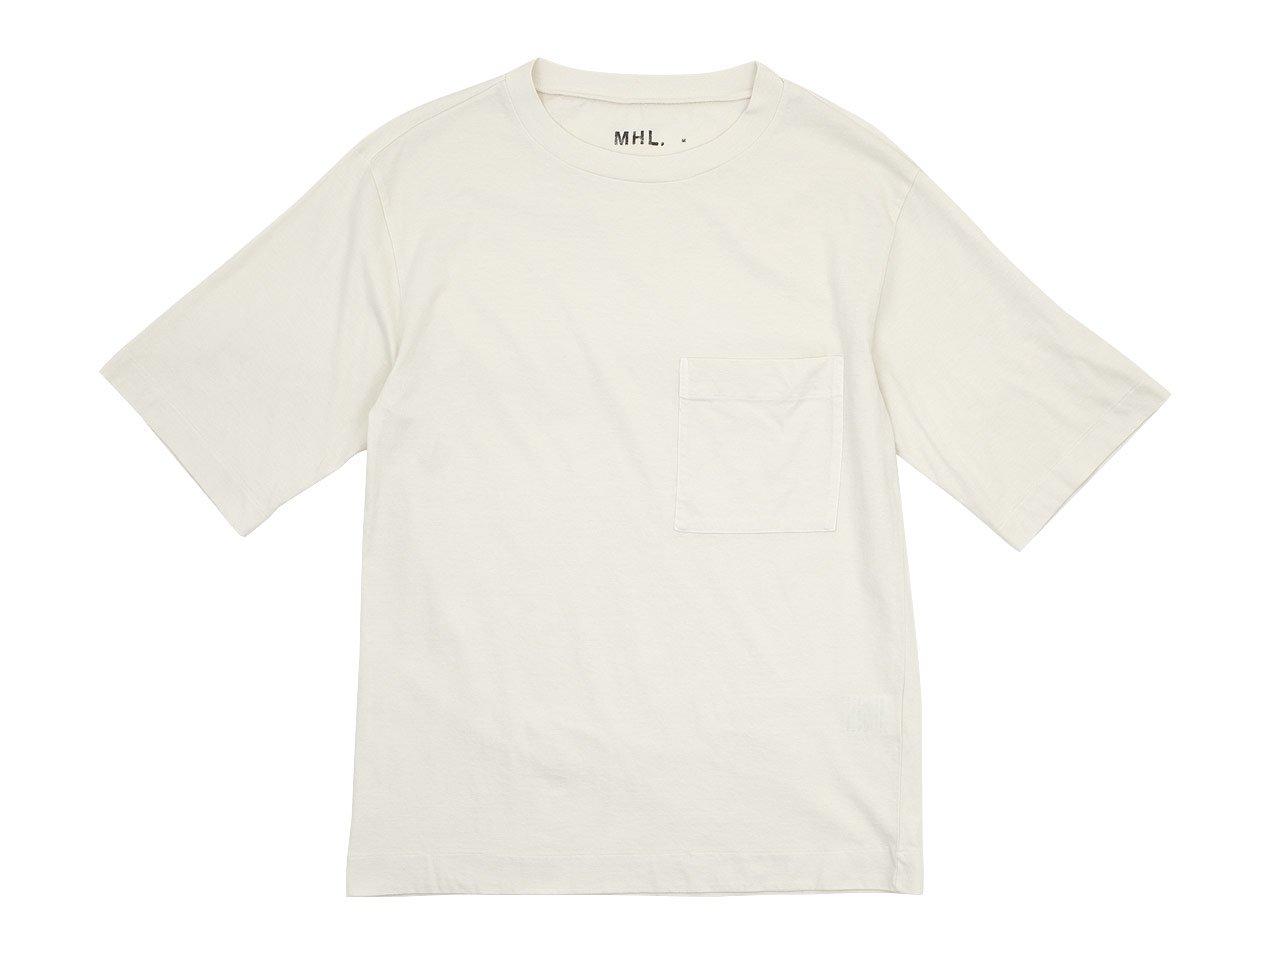 MHL. GARMENT DYE BASIC JERSEY T-SHIRTS 091GRAYISH WHITE 〔メンズ〕